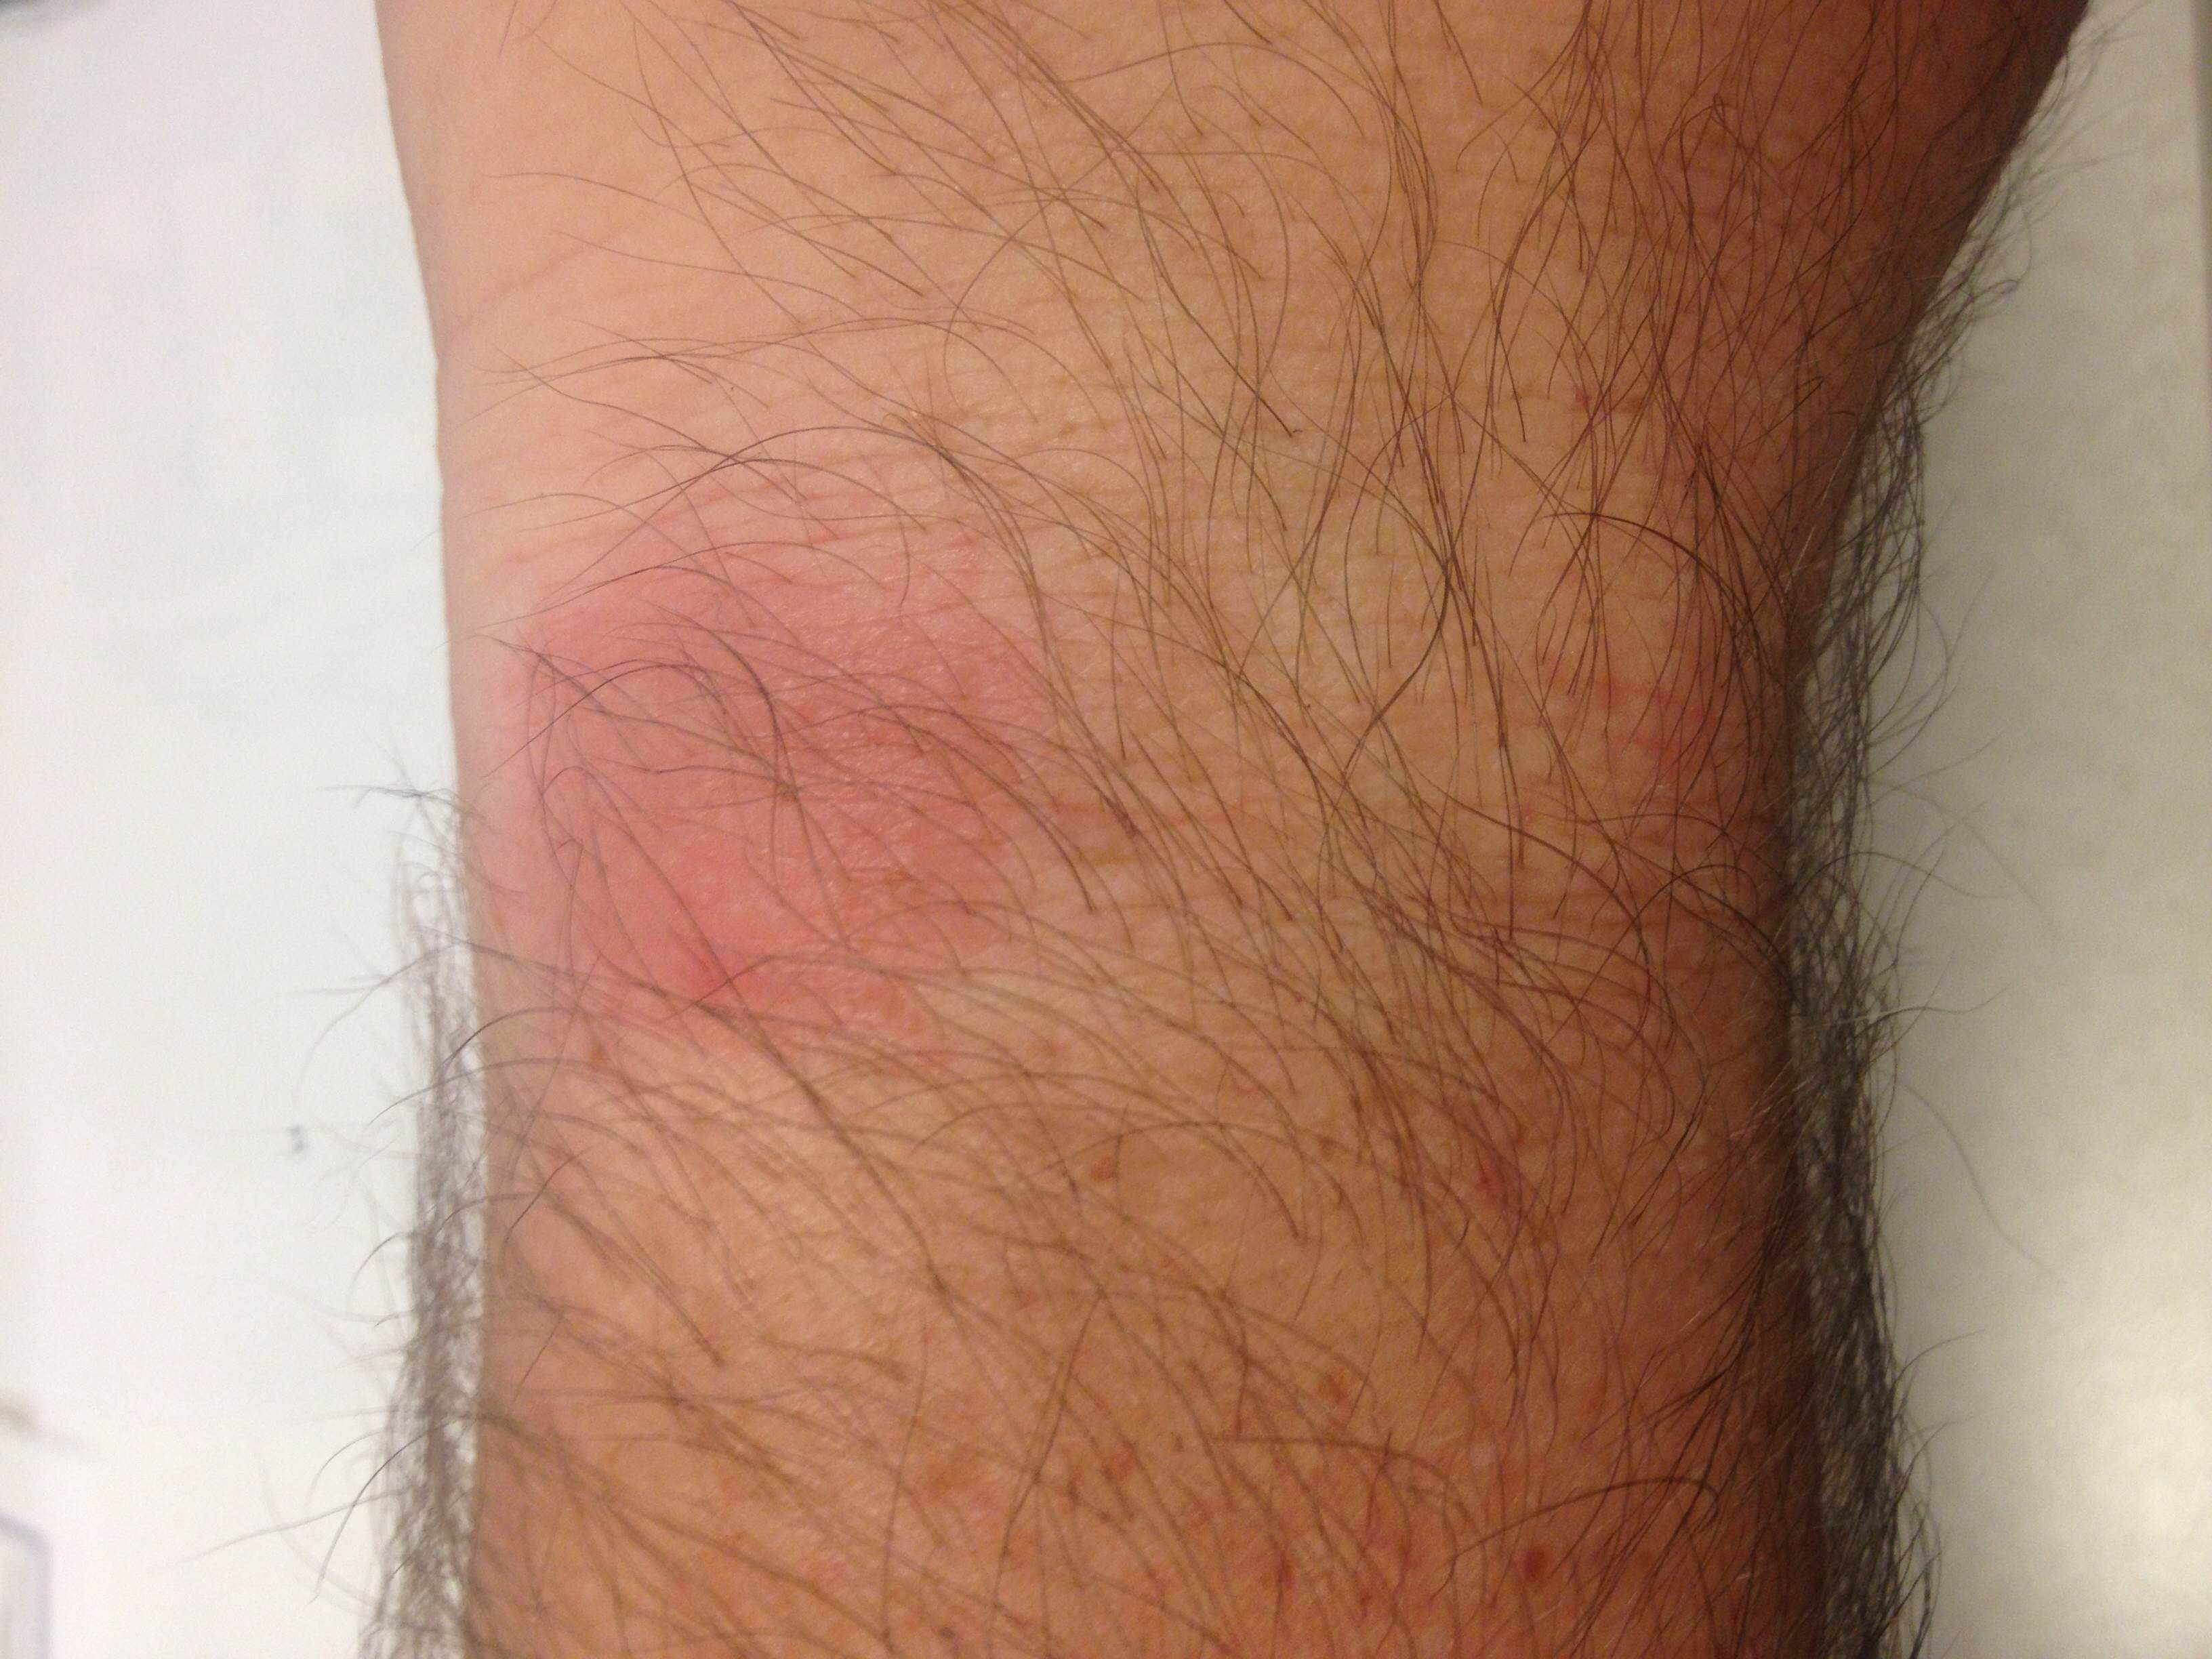 Fitbit rash